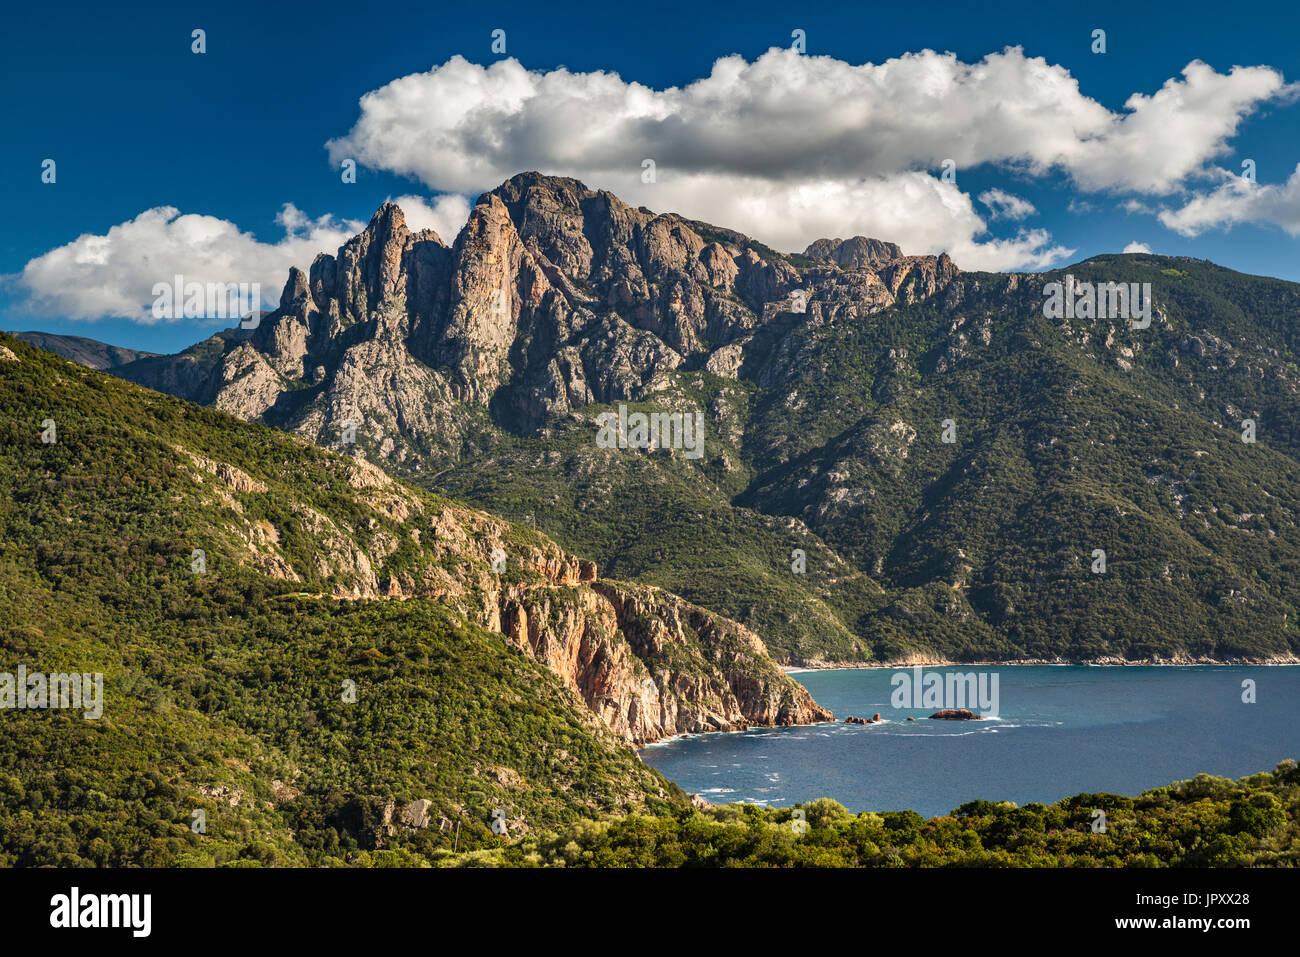 Capo d'Orto, Capo di u Vitullo derrière, sur le Golfe de Porto, Mer Méditerranée, Corse-du-Sud, Corse, France Photo Stock